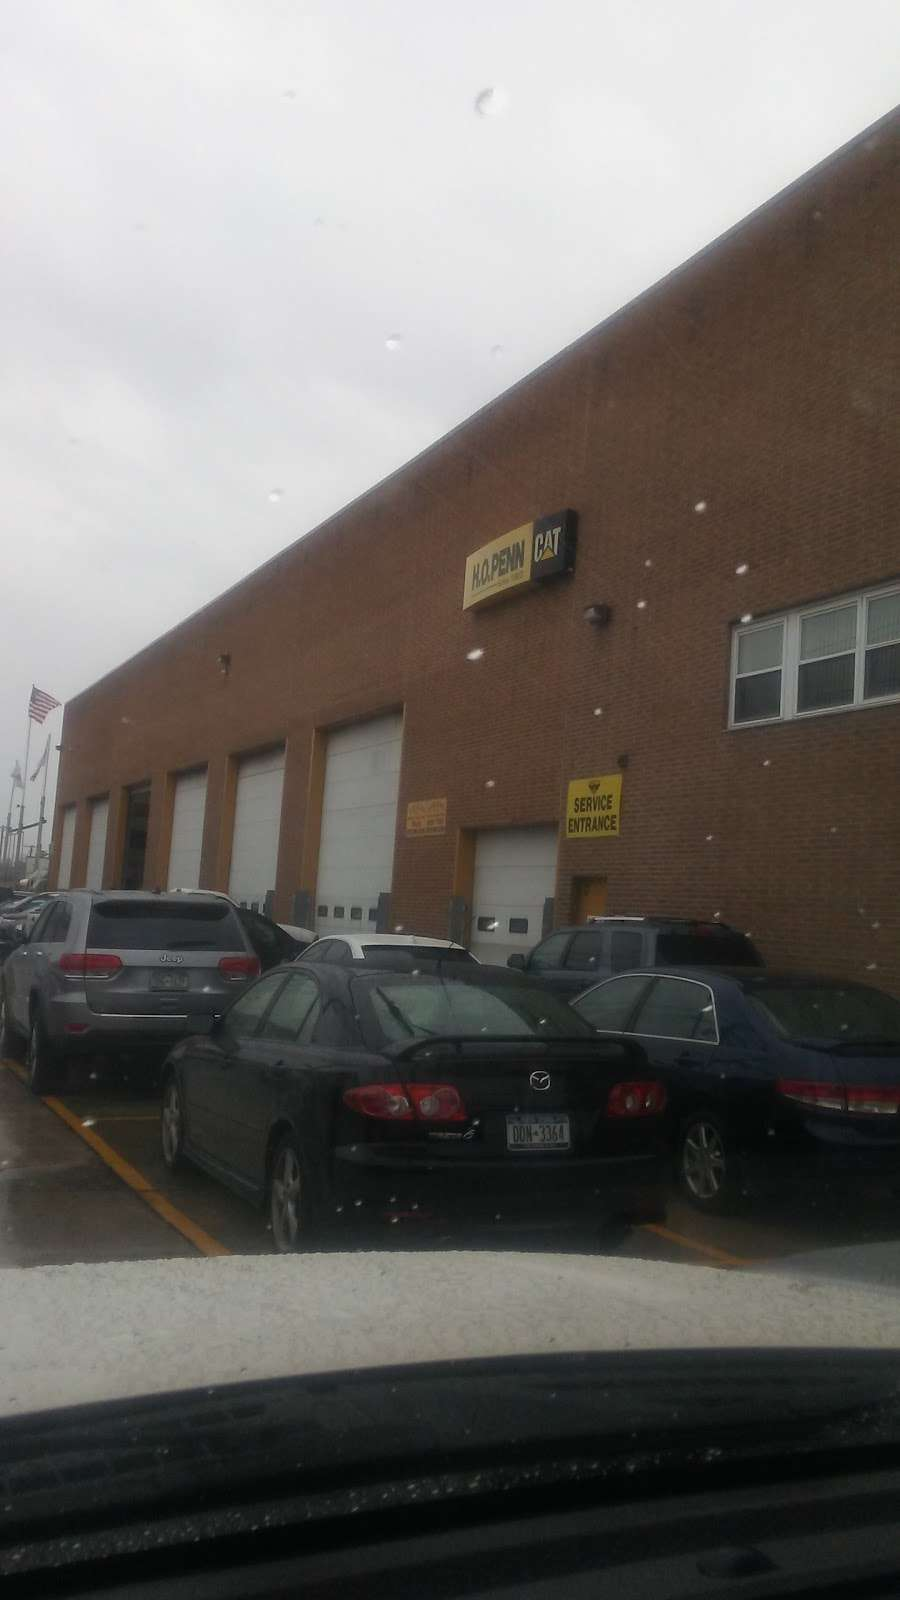 H.O. Penn Machinery Sales & Rentals - Bronx, NY - store  | Photo 6 of 6 | Address: 699 Brush Ave, Bronx, NY 10465, USA | Phone: (718) 863-3800